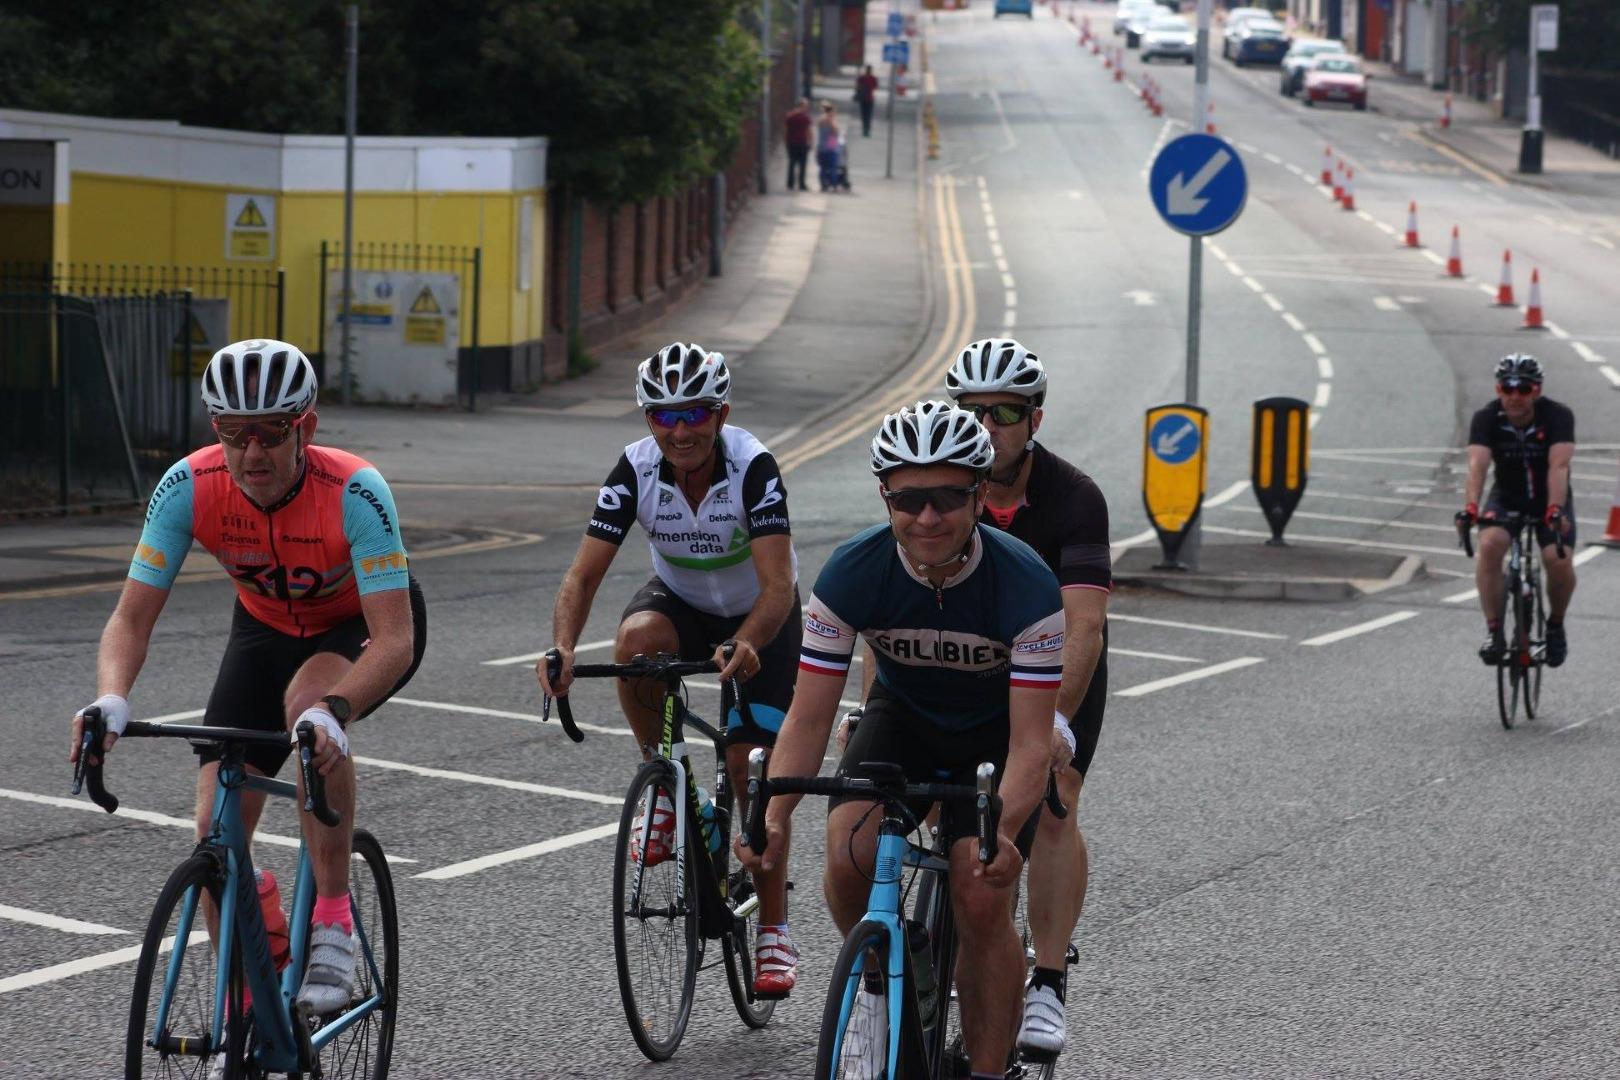 IRONMAN UK passes through Horwich!